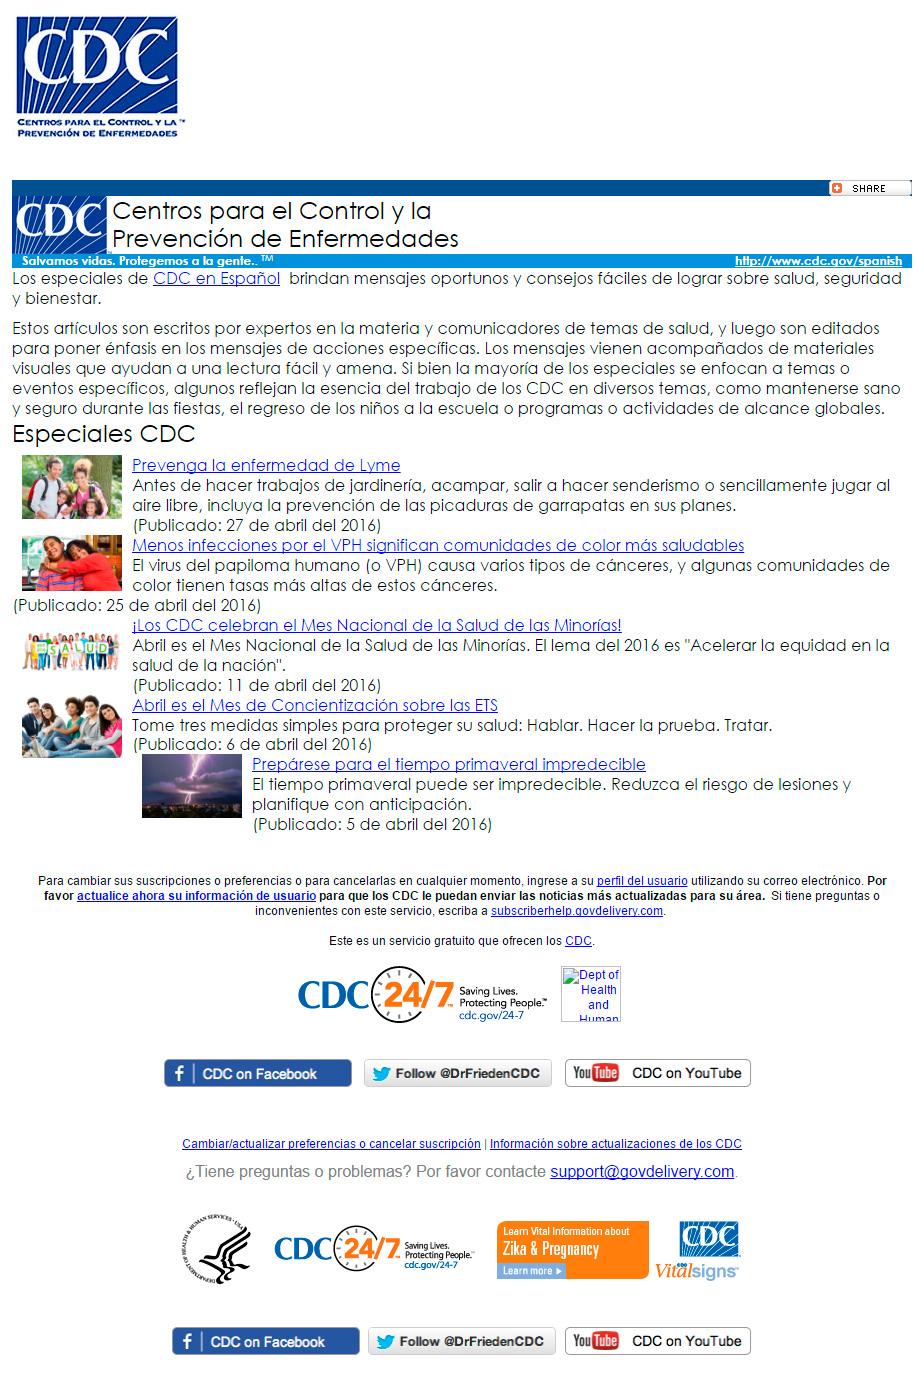 cdc_1